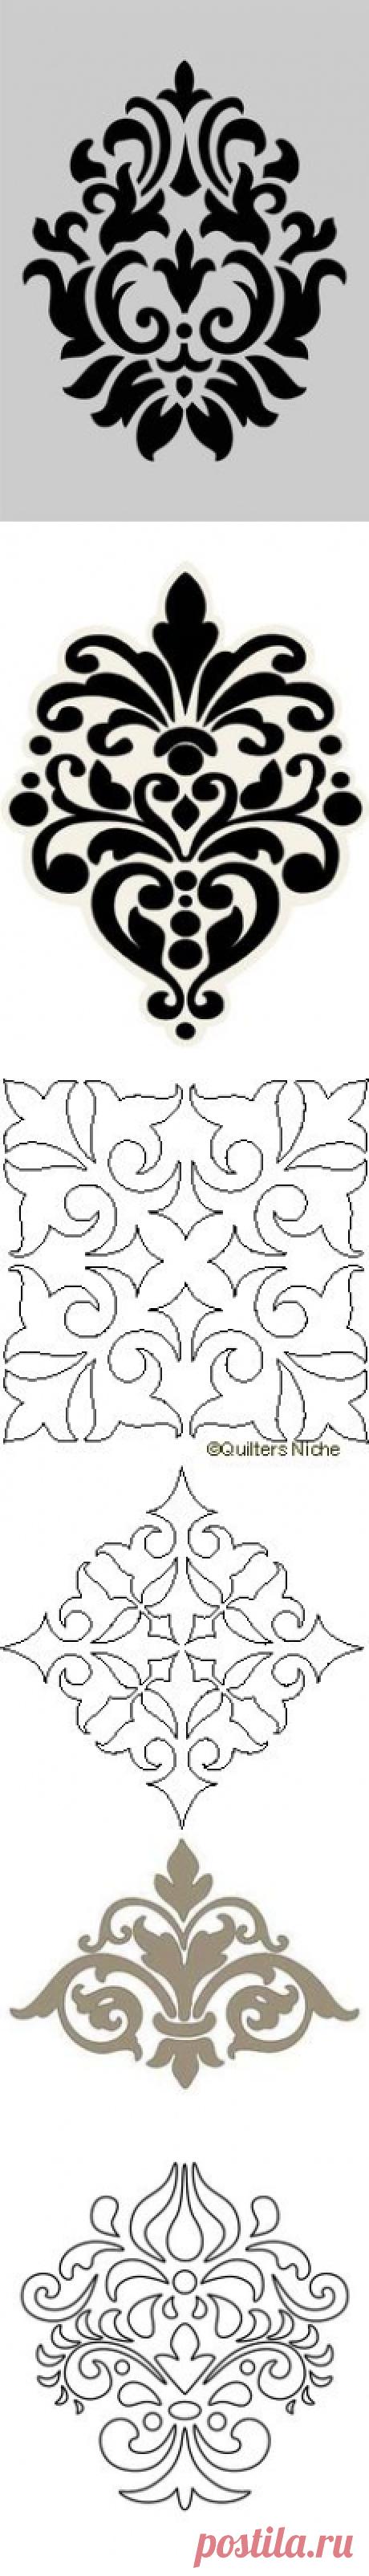 (162) damask baroque design template | Идеи